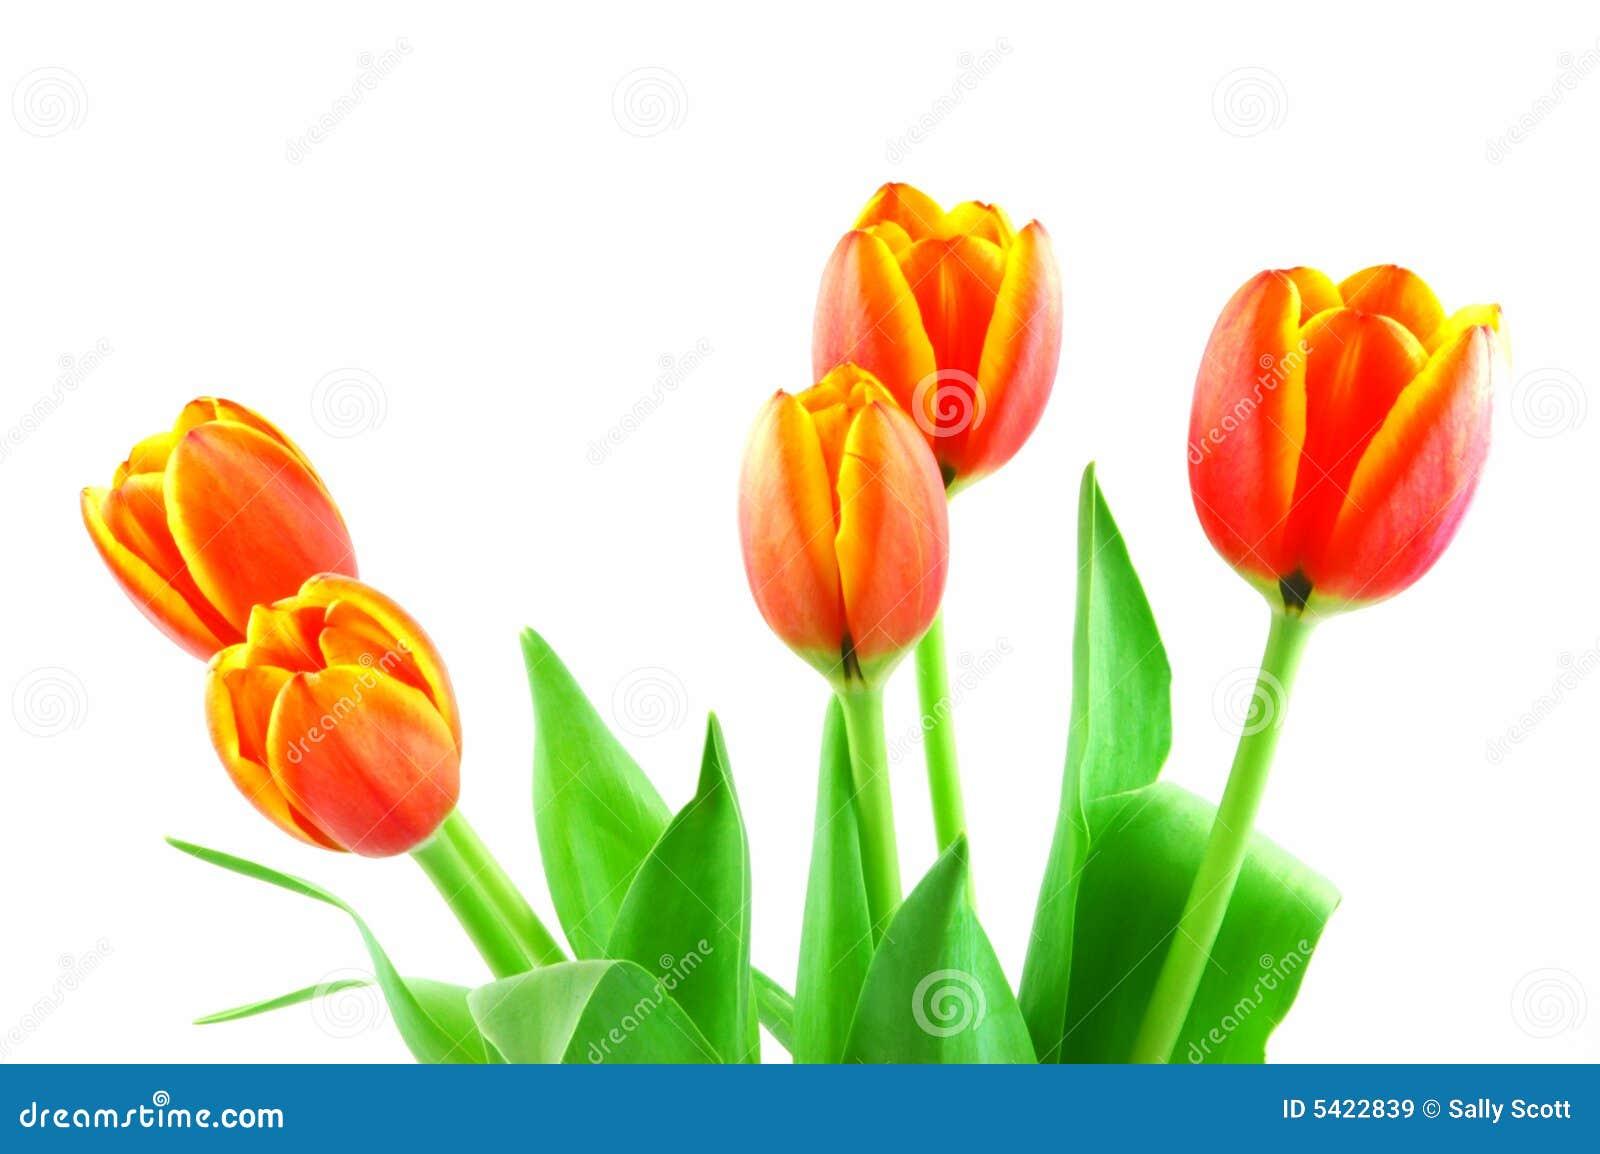 Tulipani arancioni immagini stock libere da diritti for Tulipani arancioni